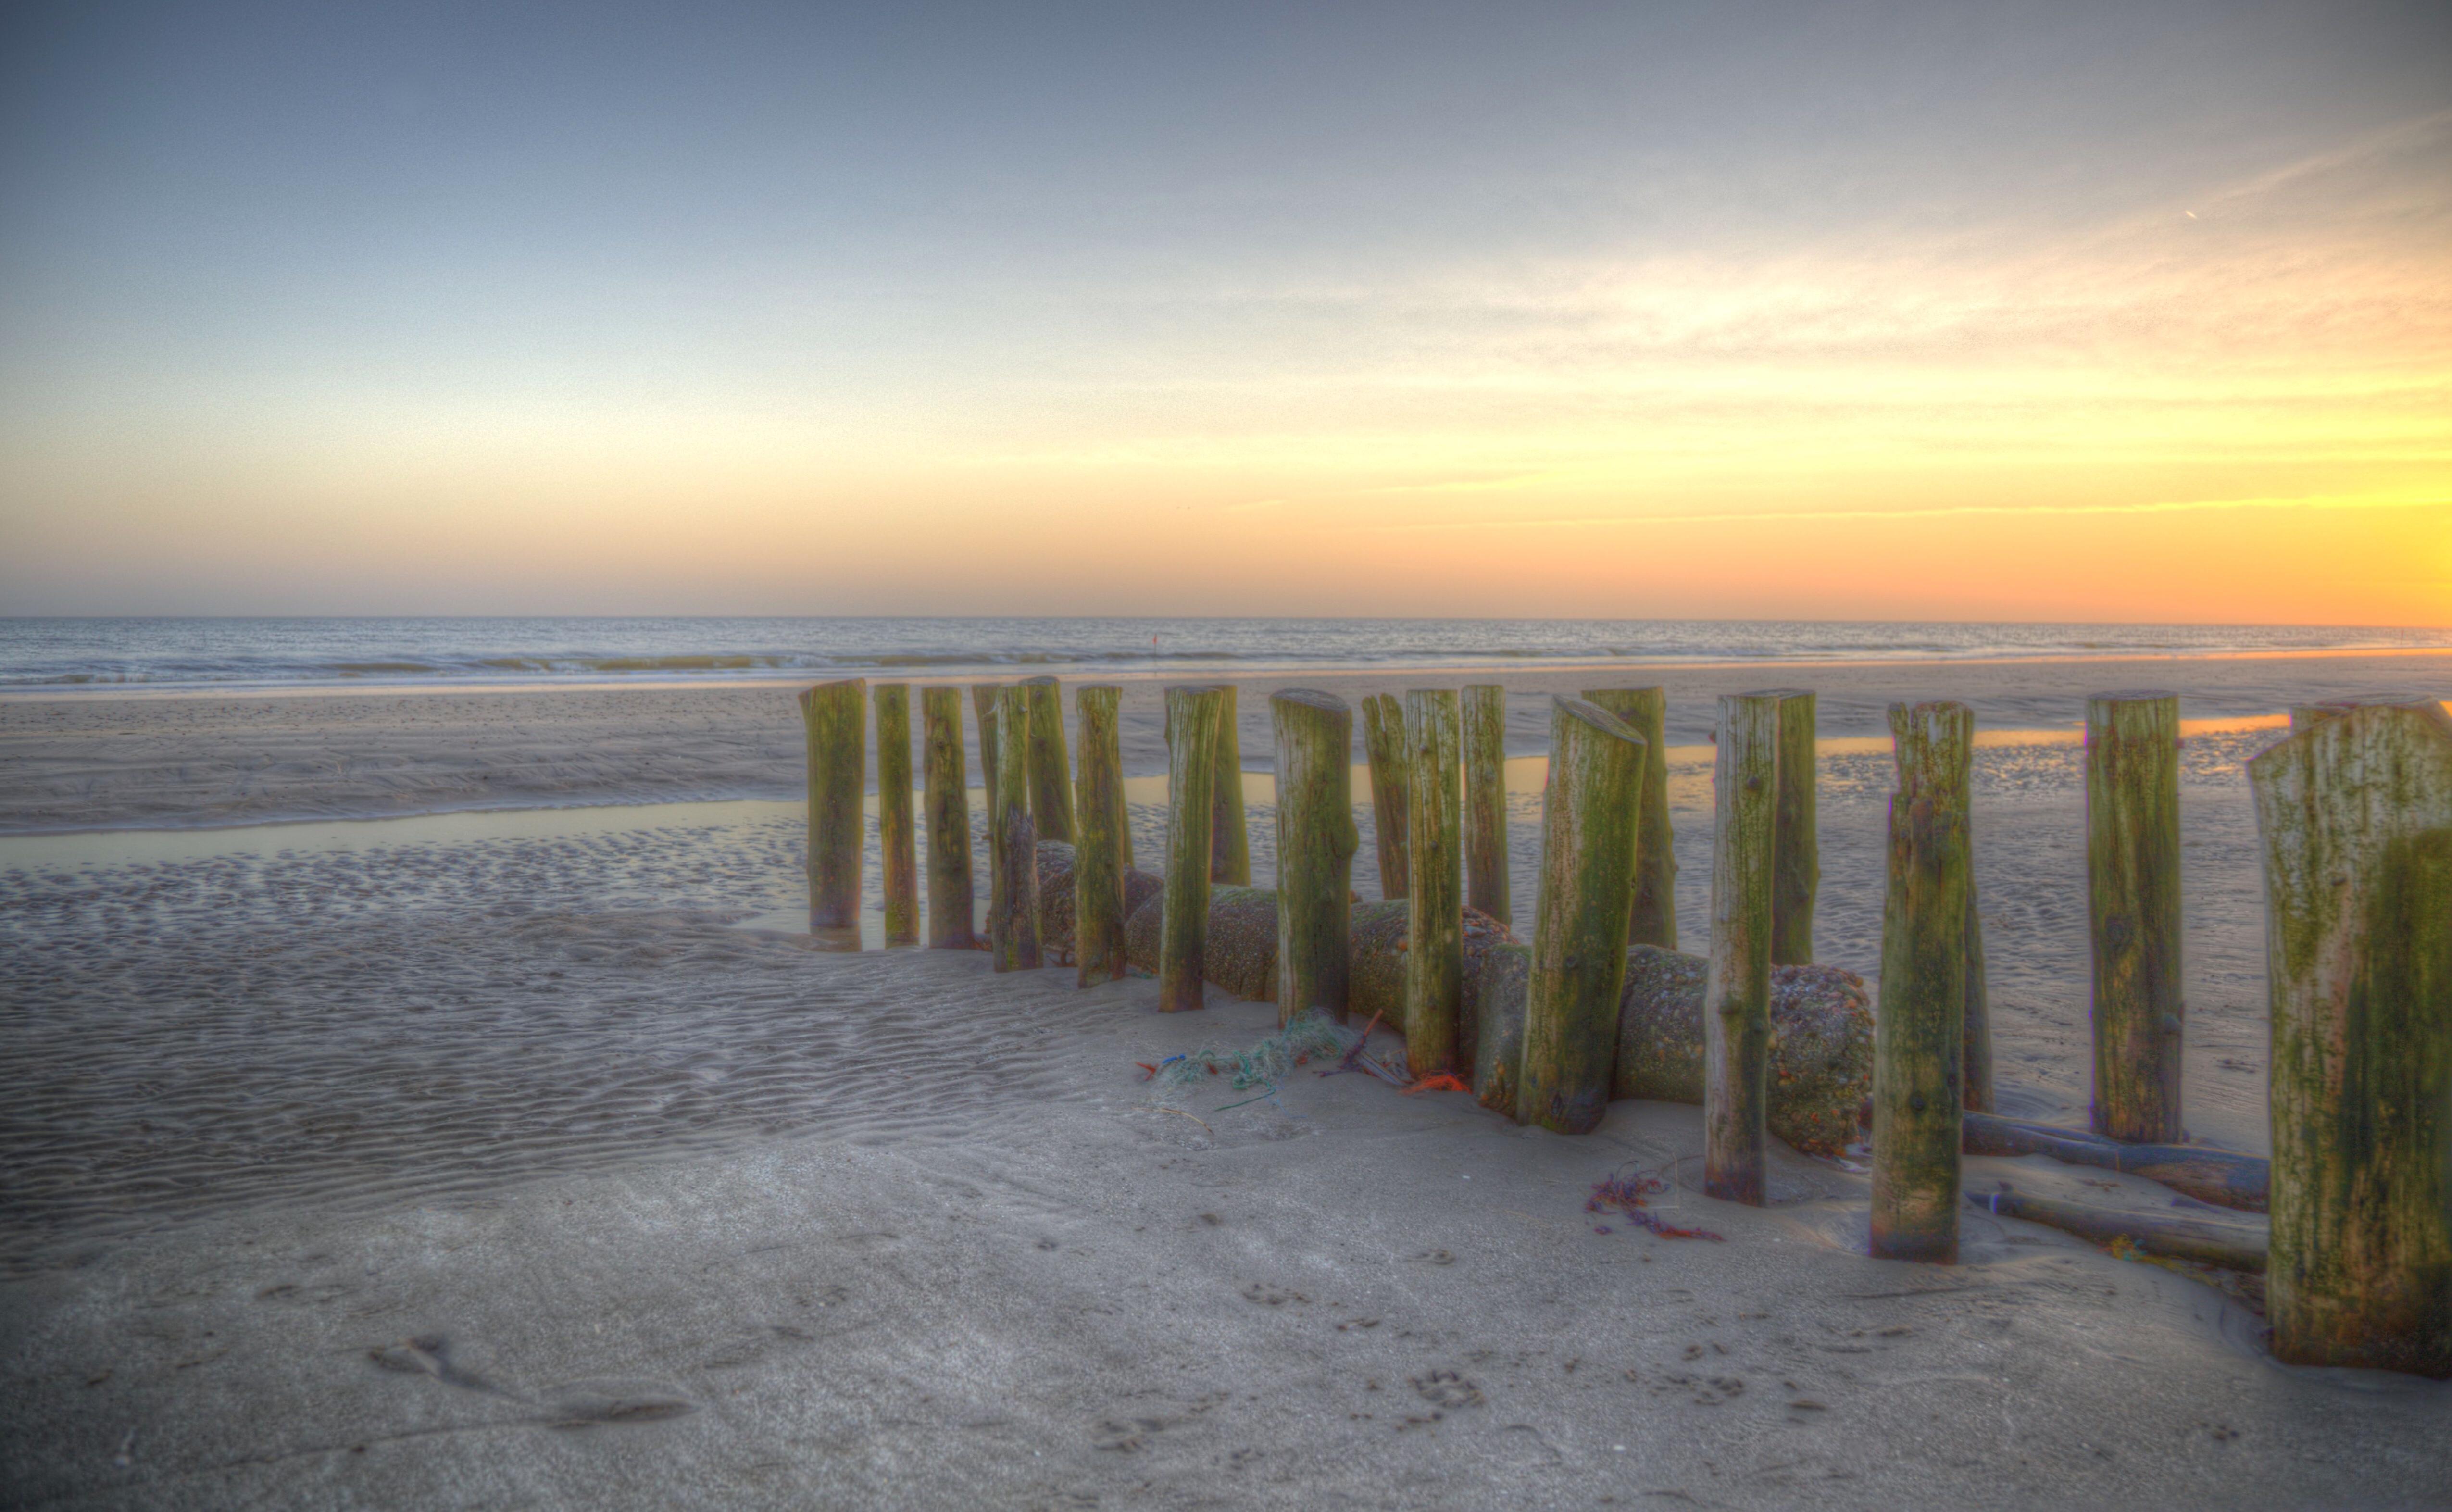 Strand nordsee sonnenuntergang  Hintergrundbilder : Sonnenlicht, Landschaft, Sonnenuntergang, Meer ...